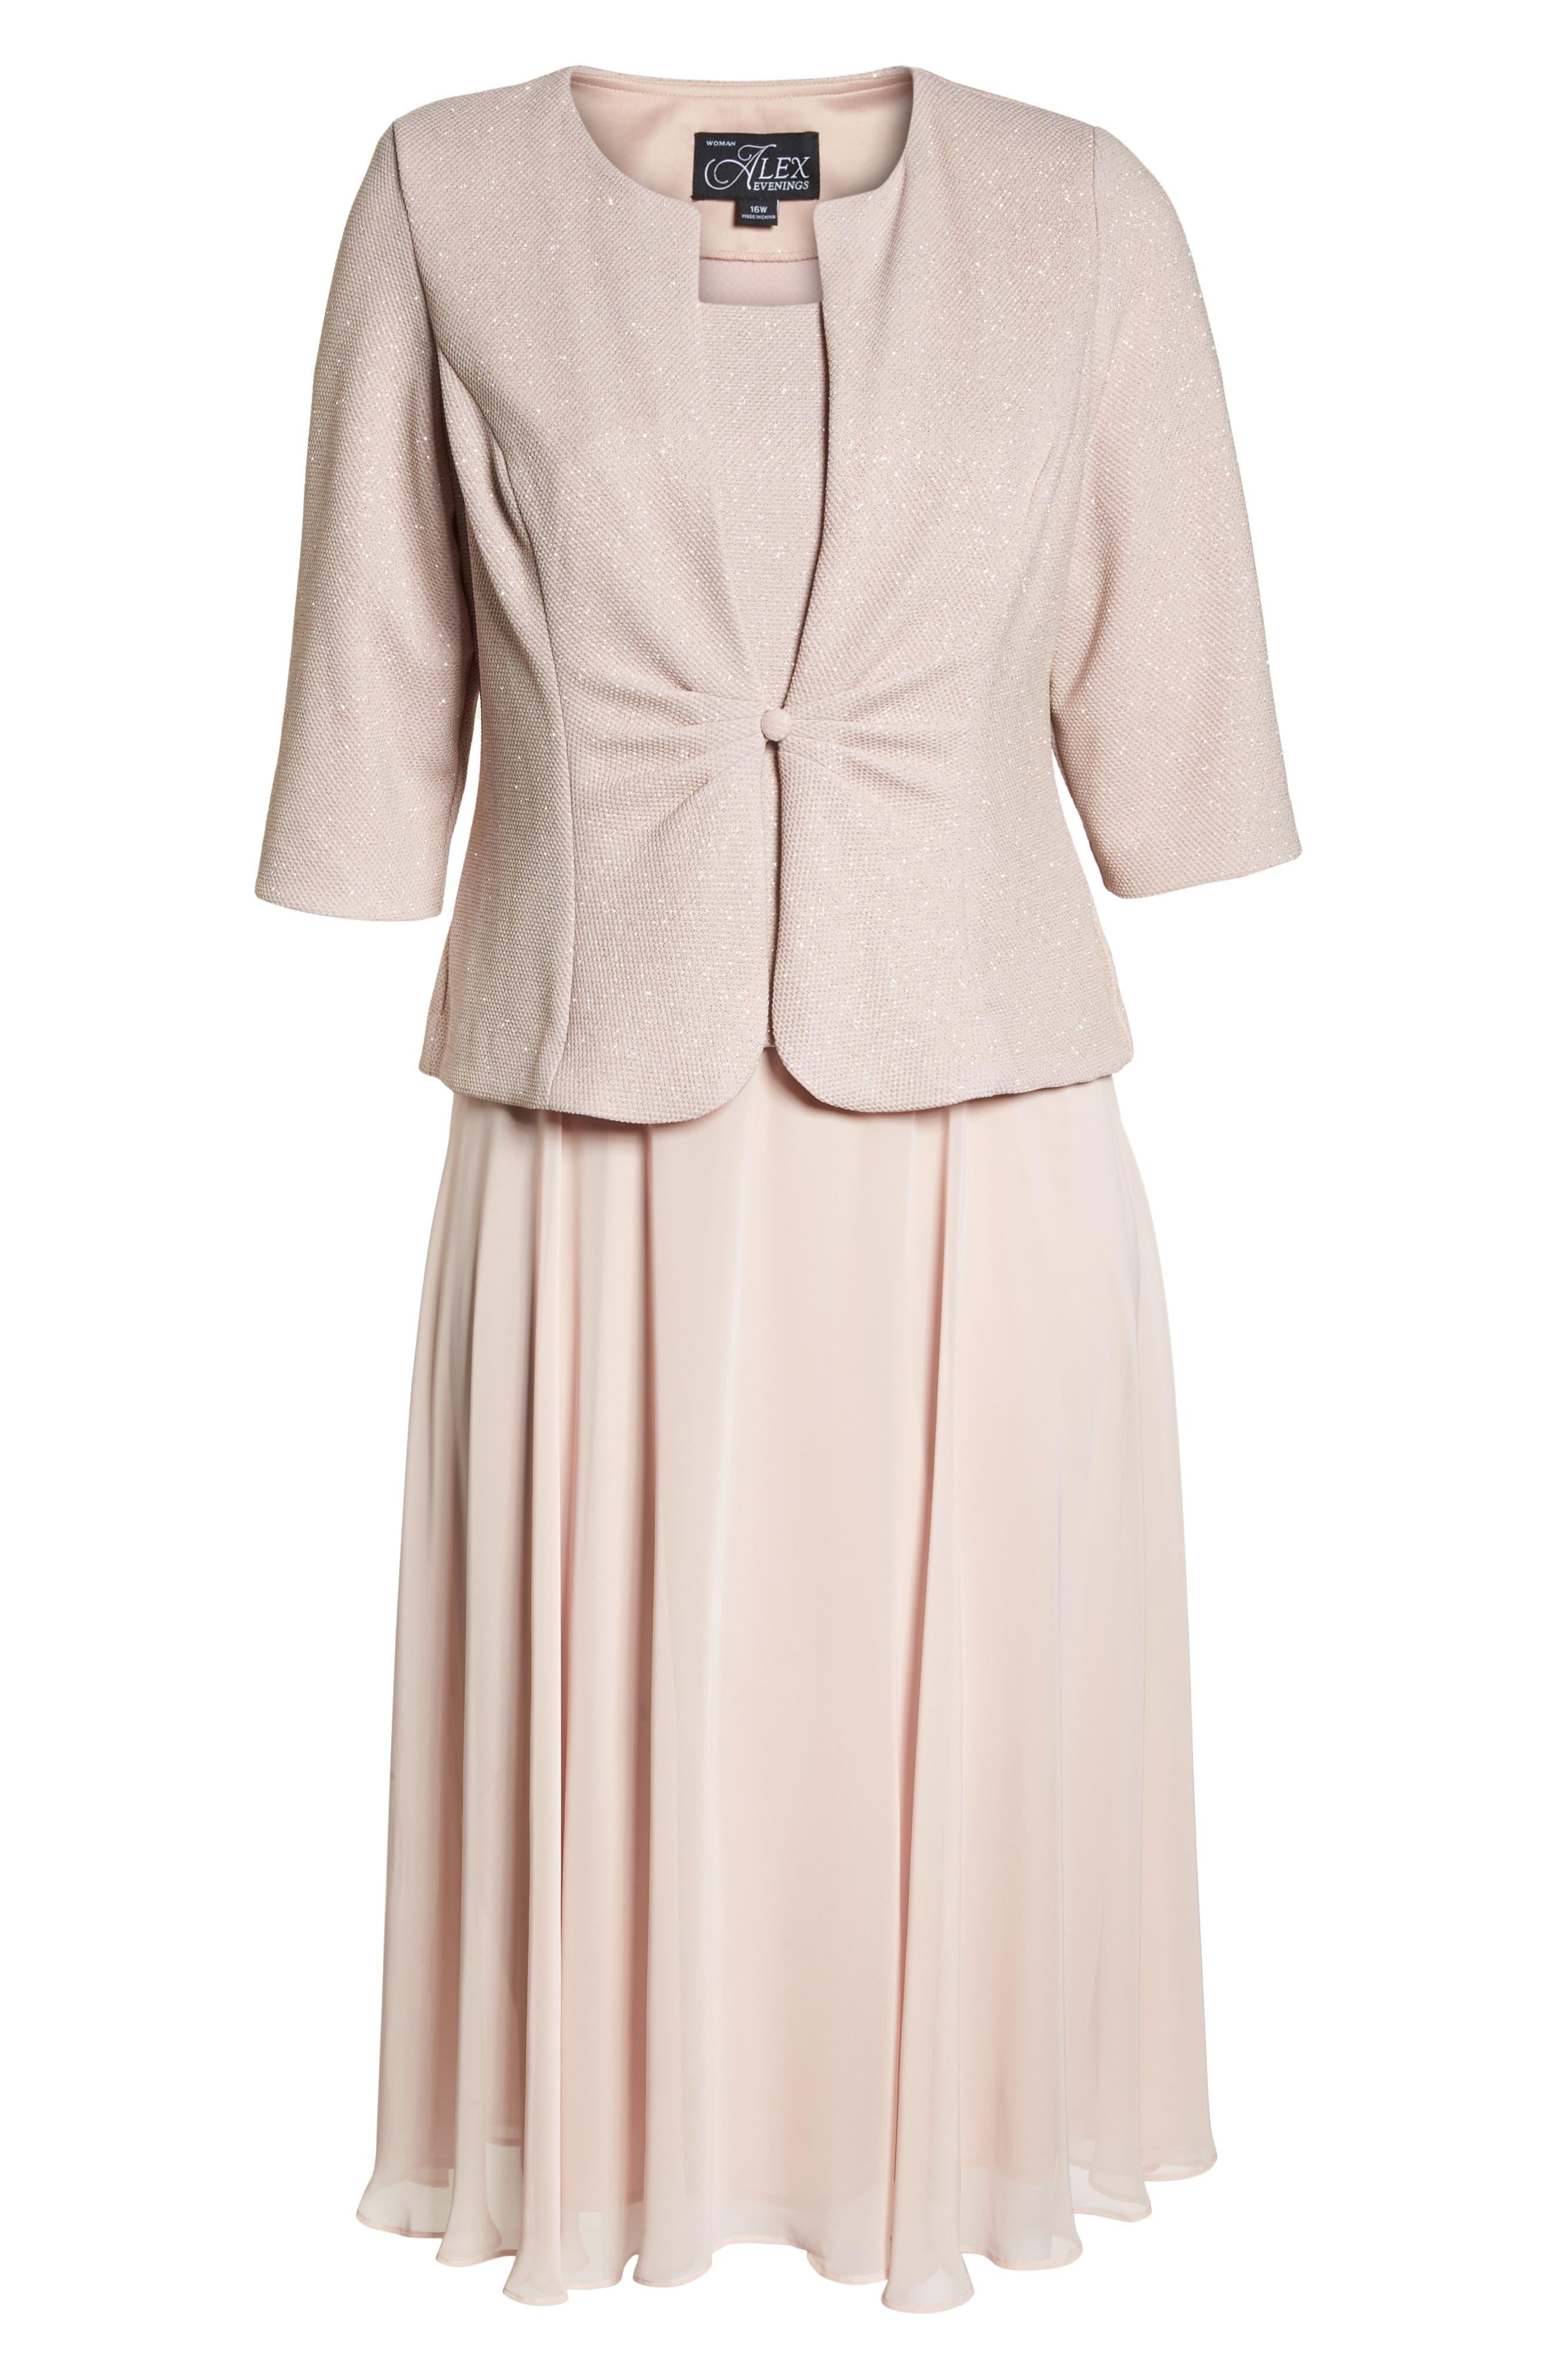 Glitter Tea Length A-Line Dress with Jacket,                             Alternate thumbnail 6, color,                             680